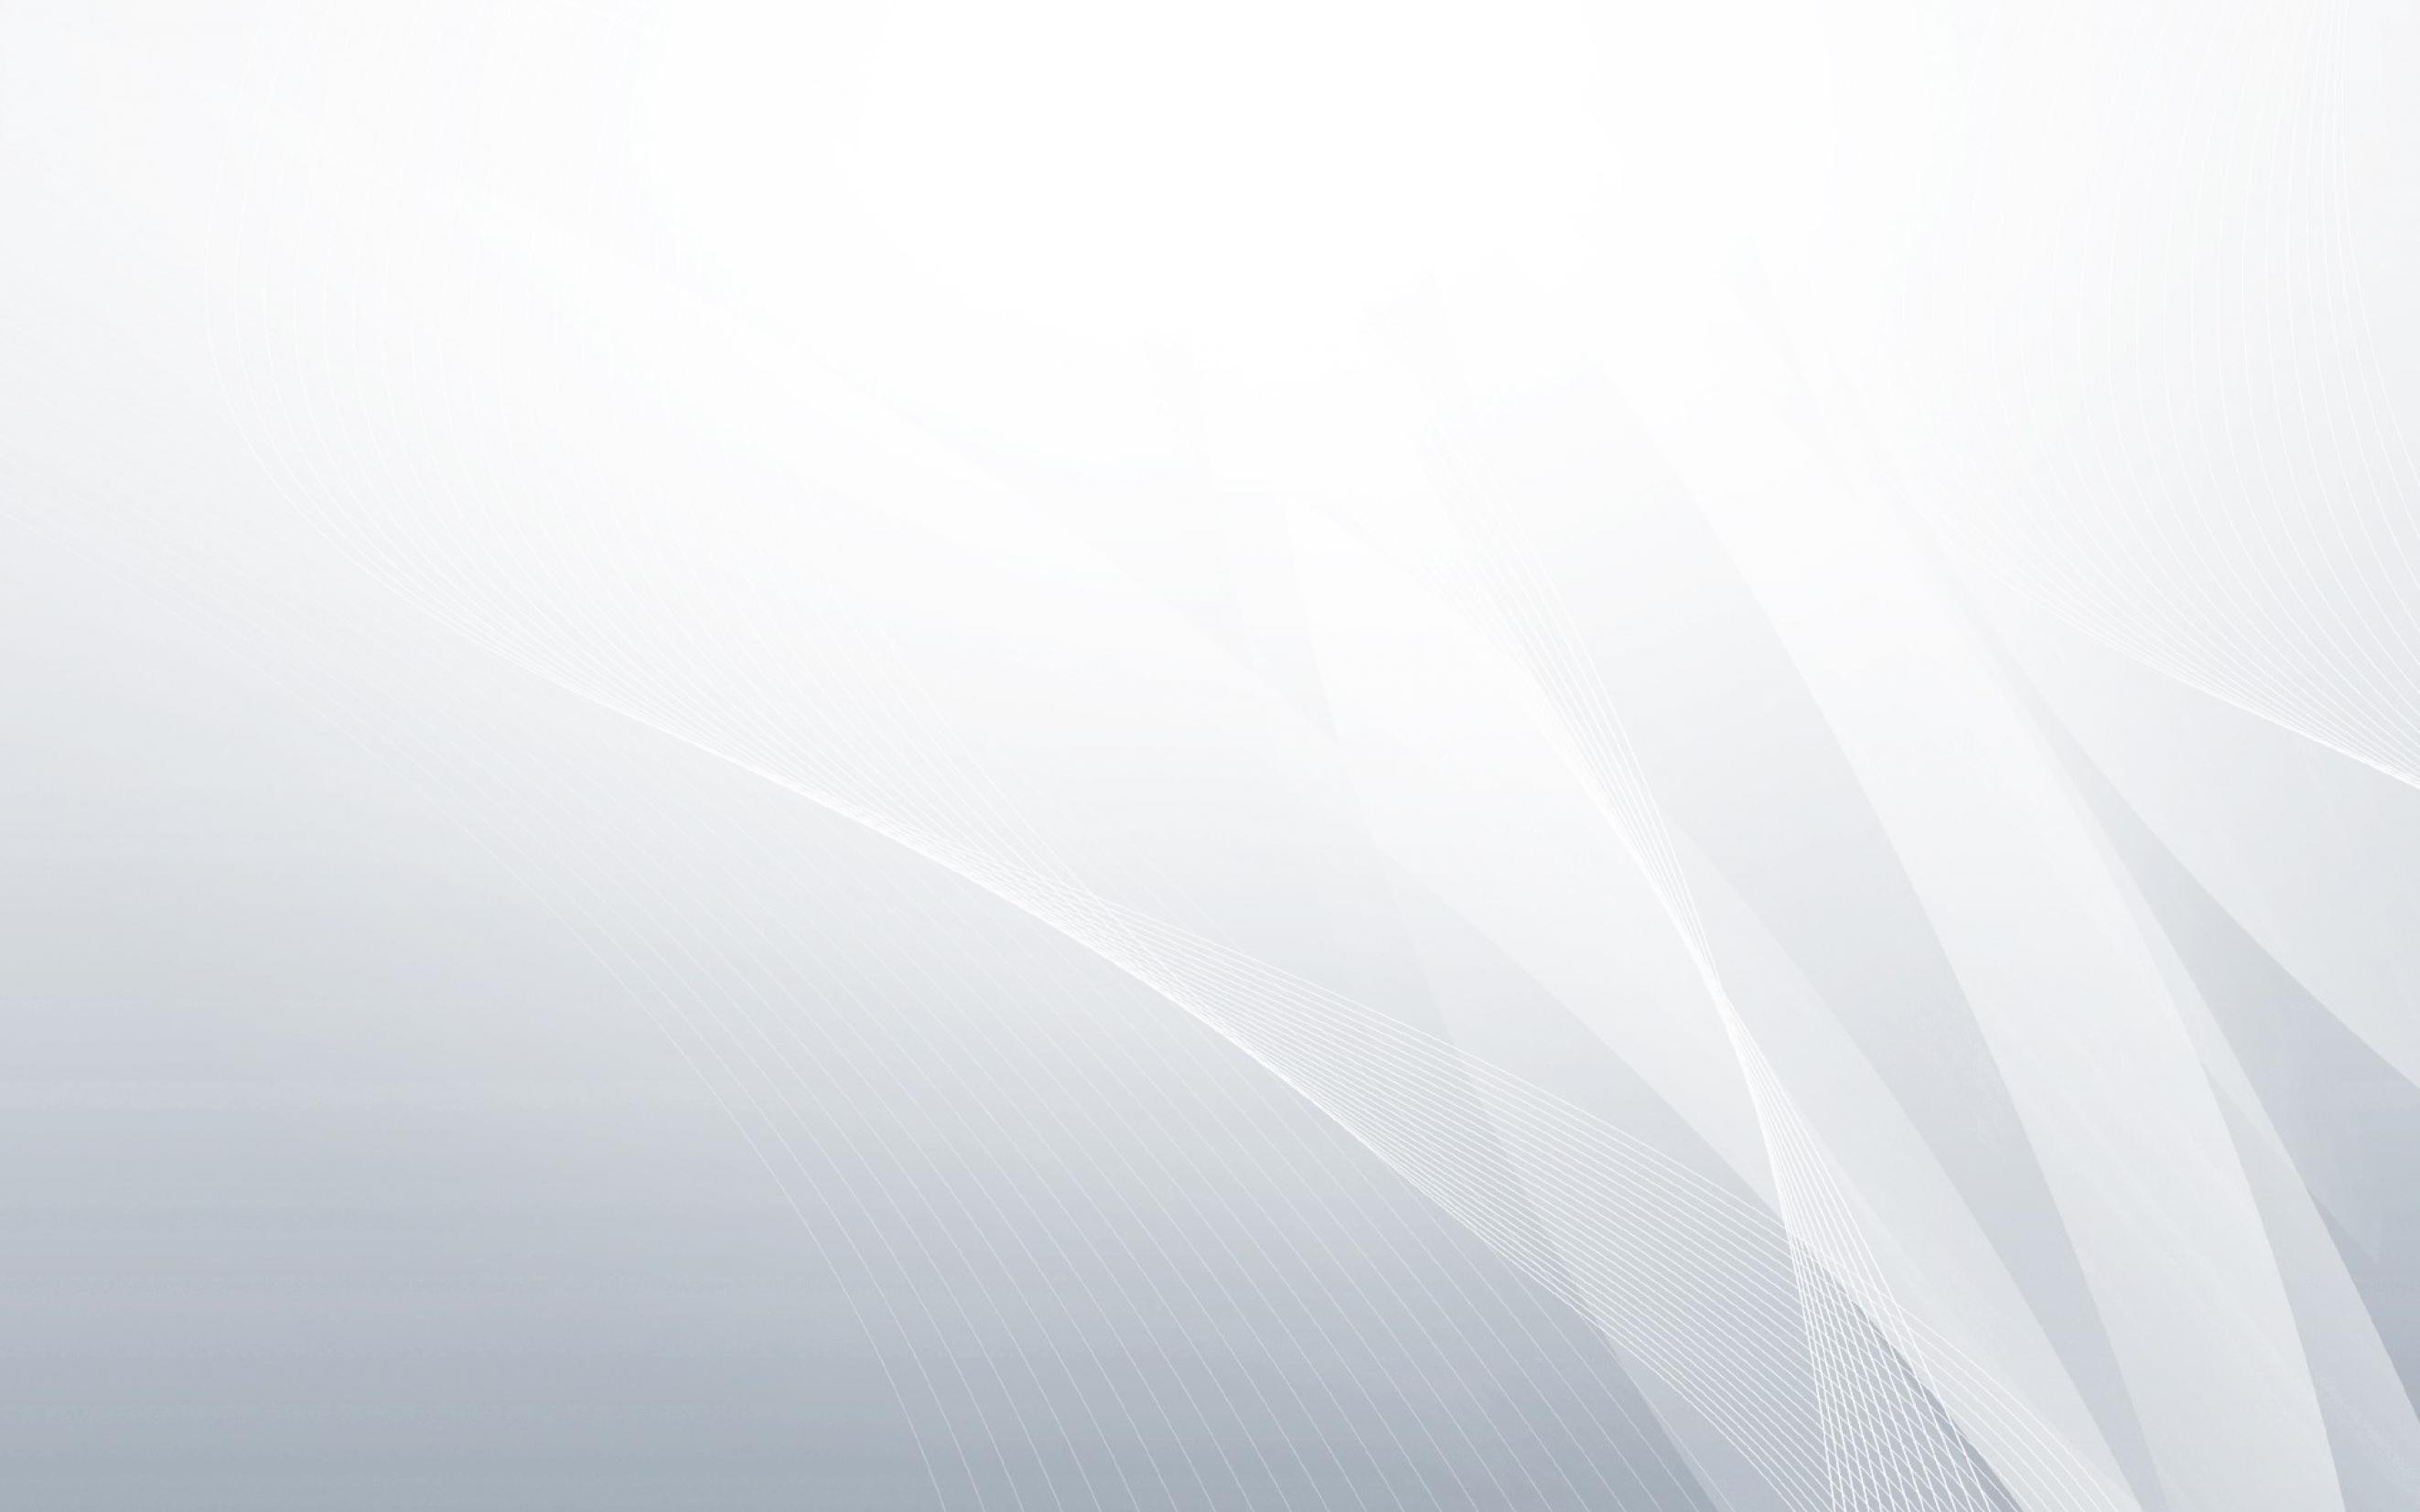 Картинка: Белый фон, серый, линии, полосы